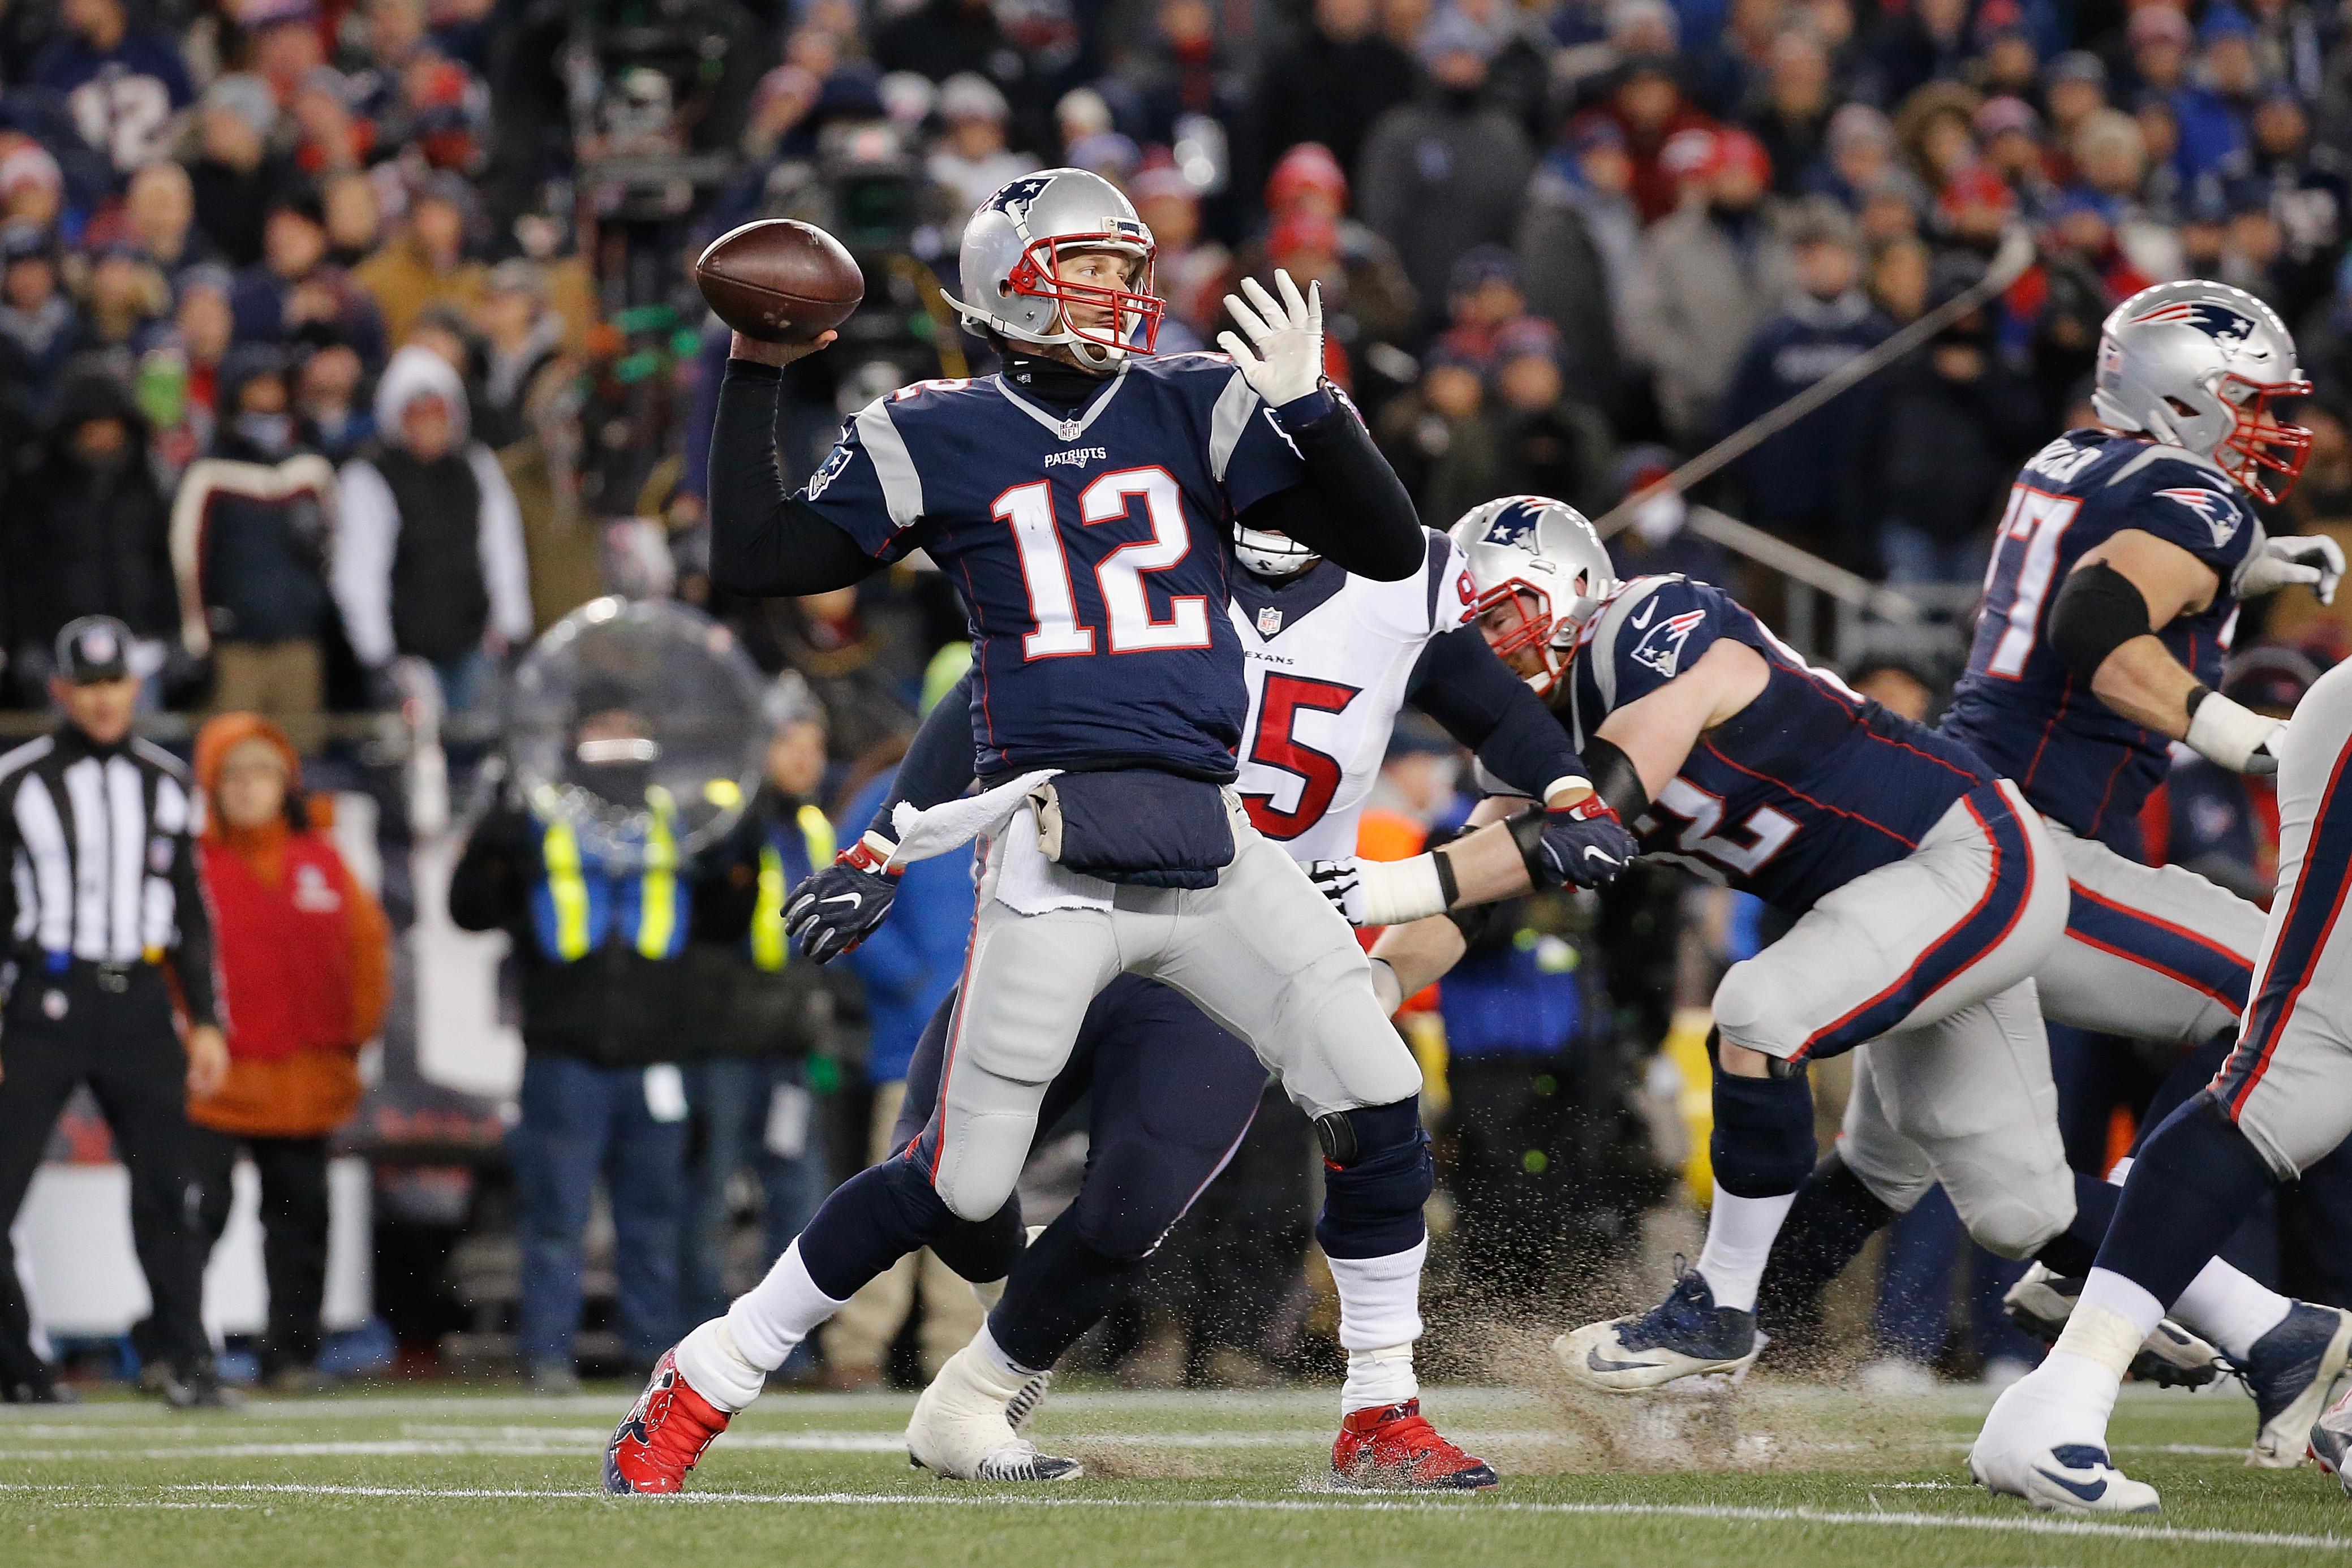 [NFL] Super Bowl LI: Tom Brady, habitué delle finali